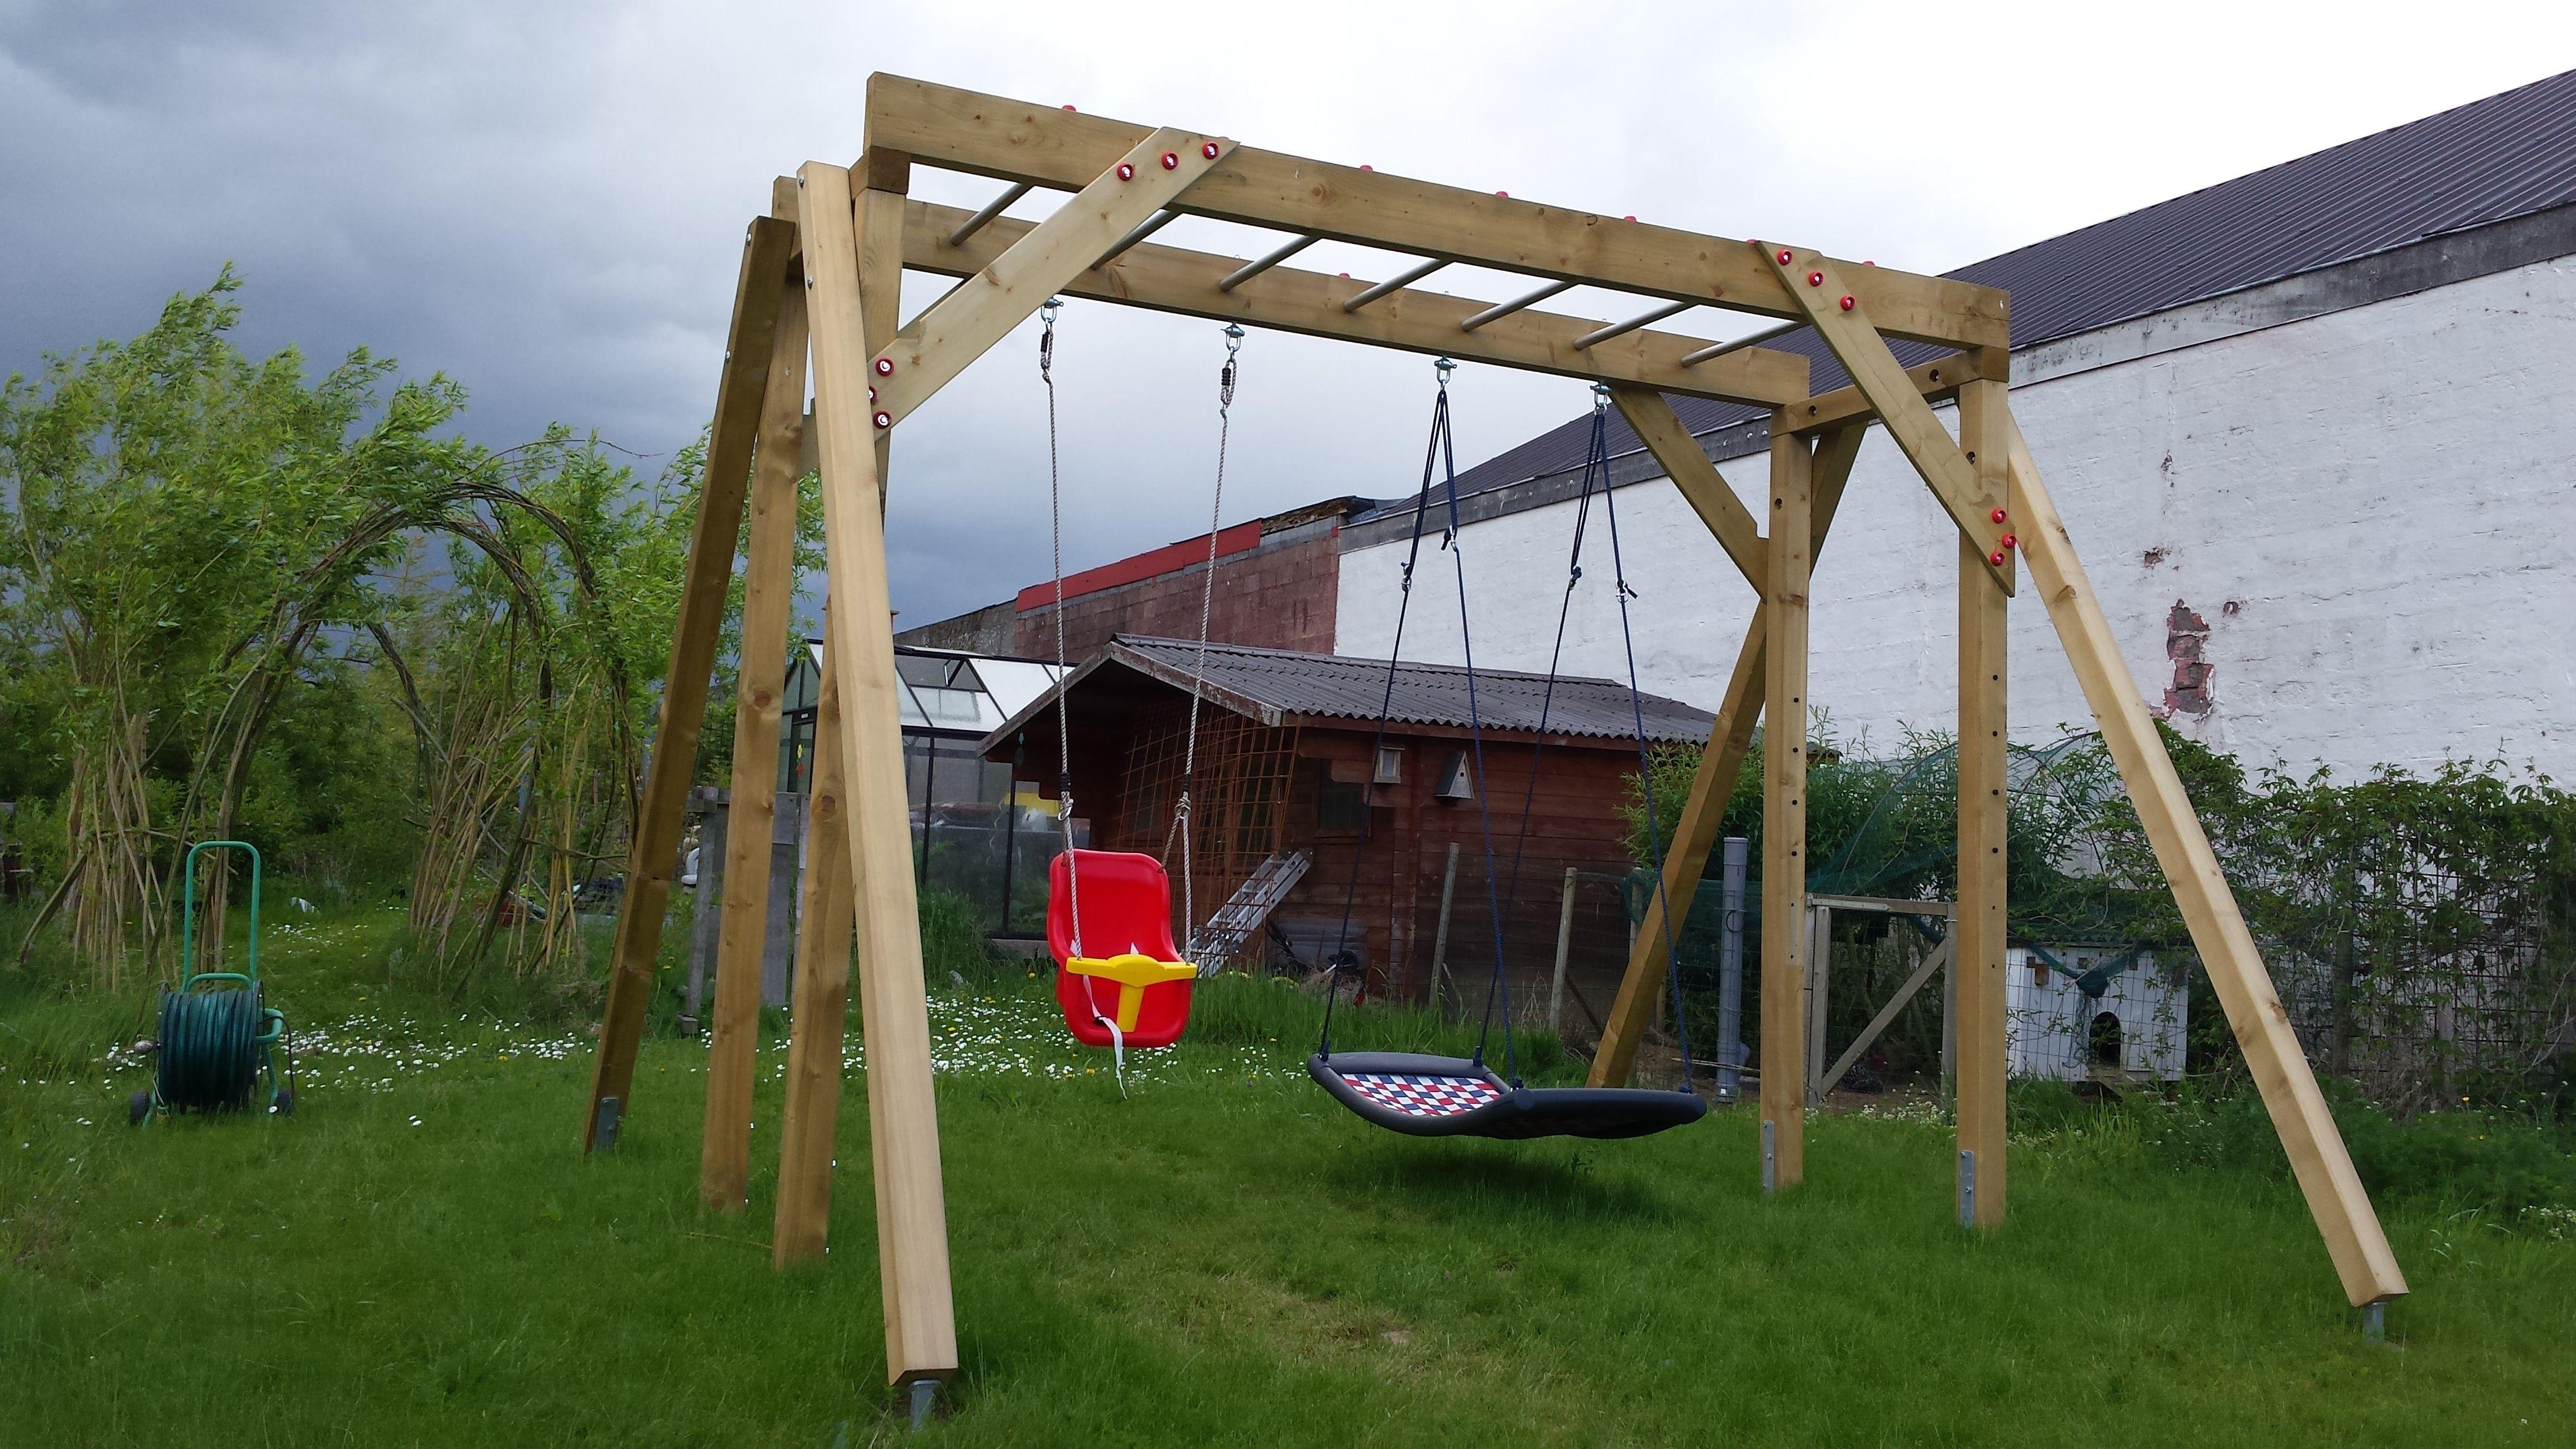 Beste schommel met klimrek | swing CE-77